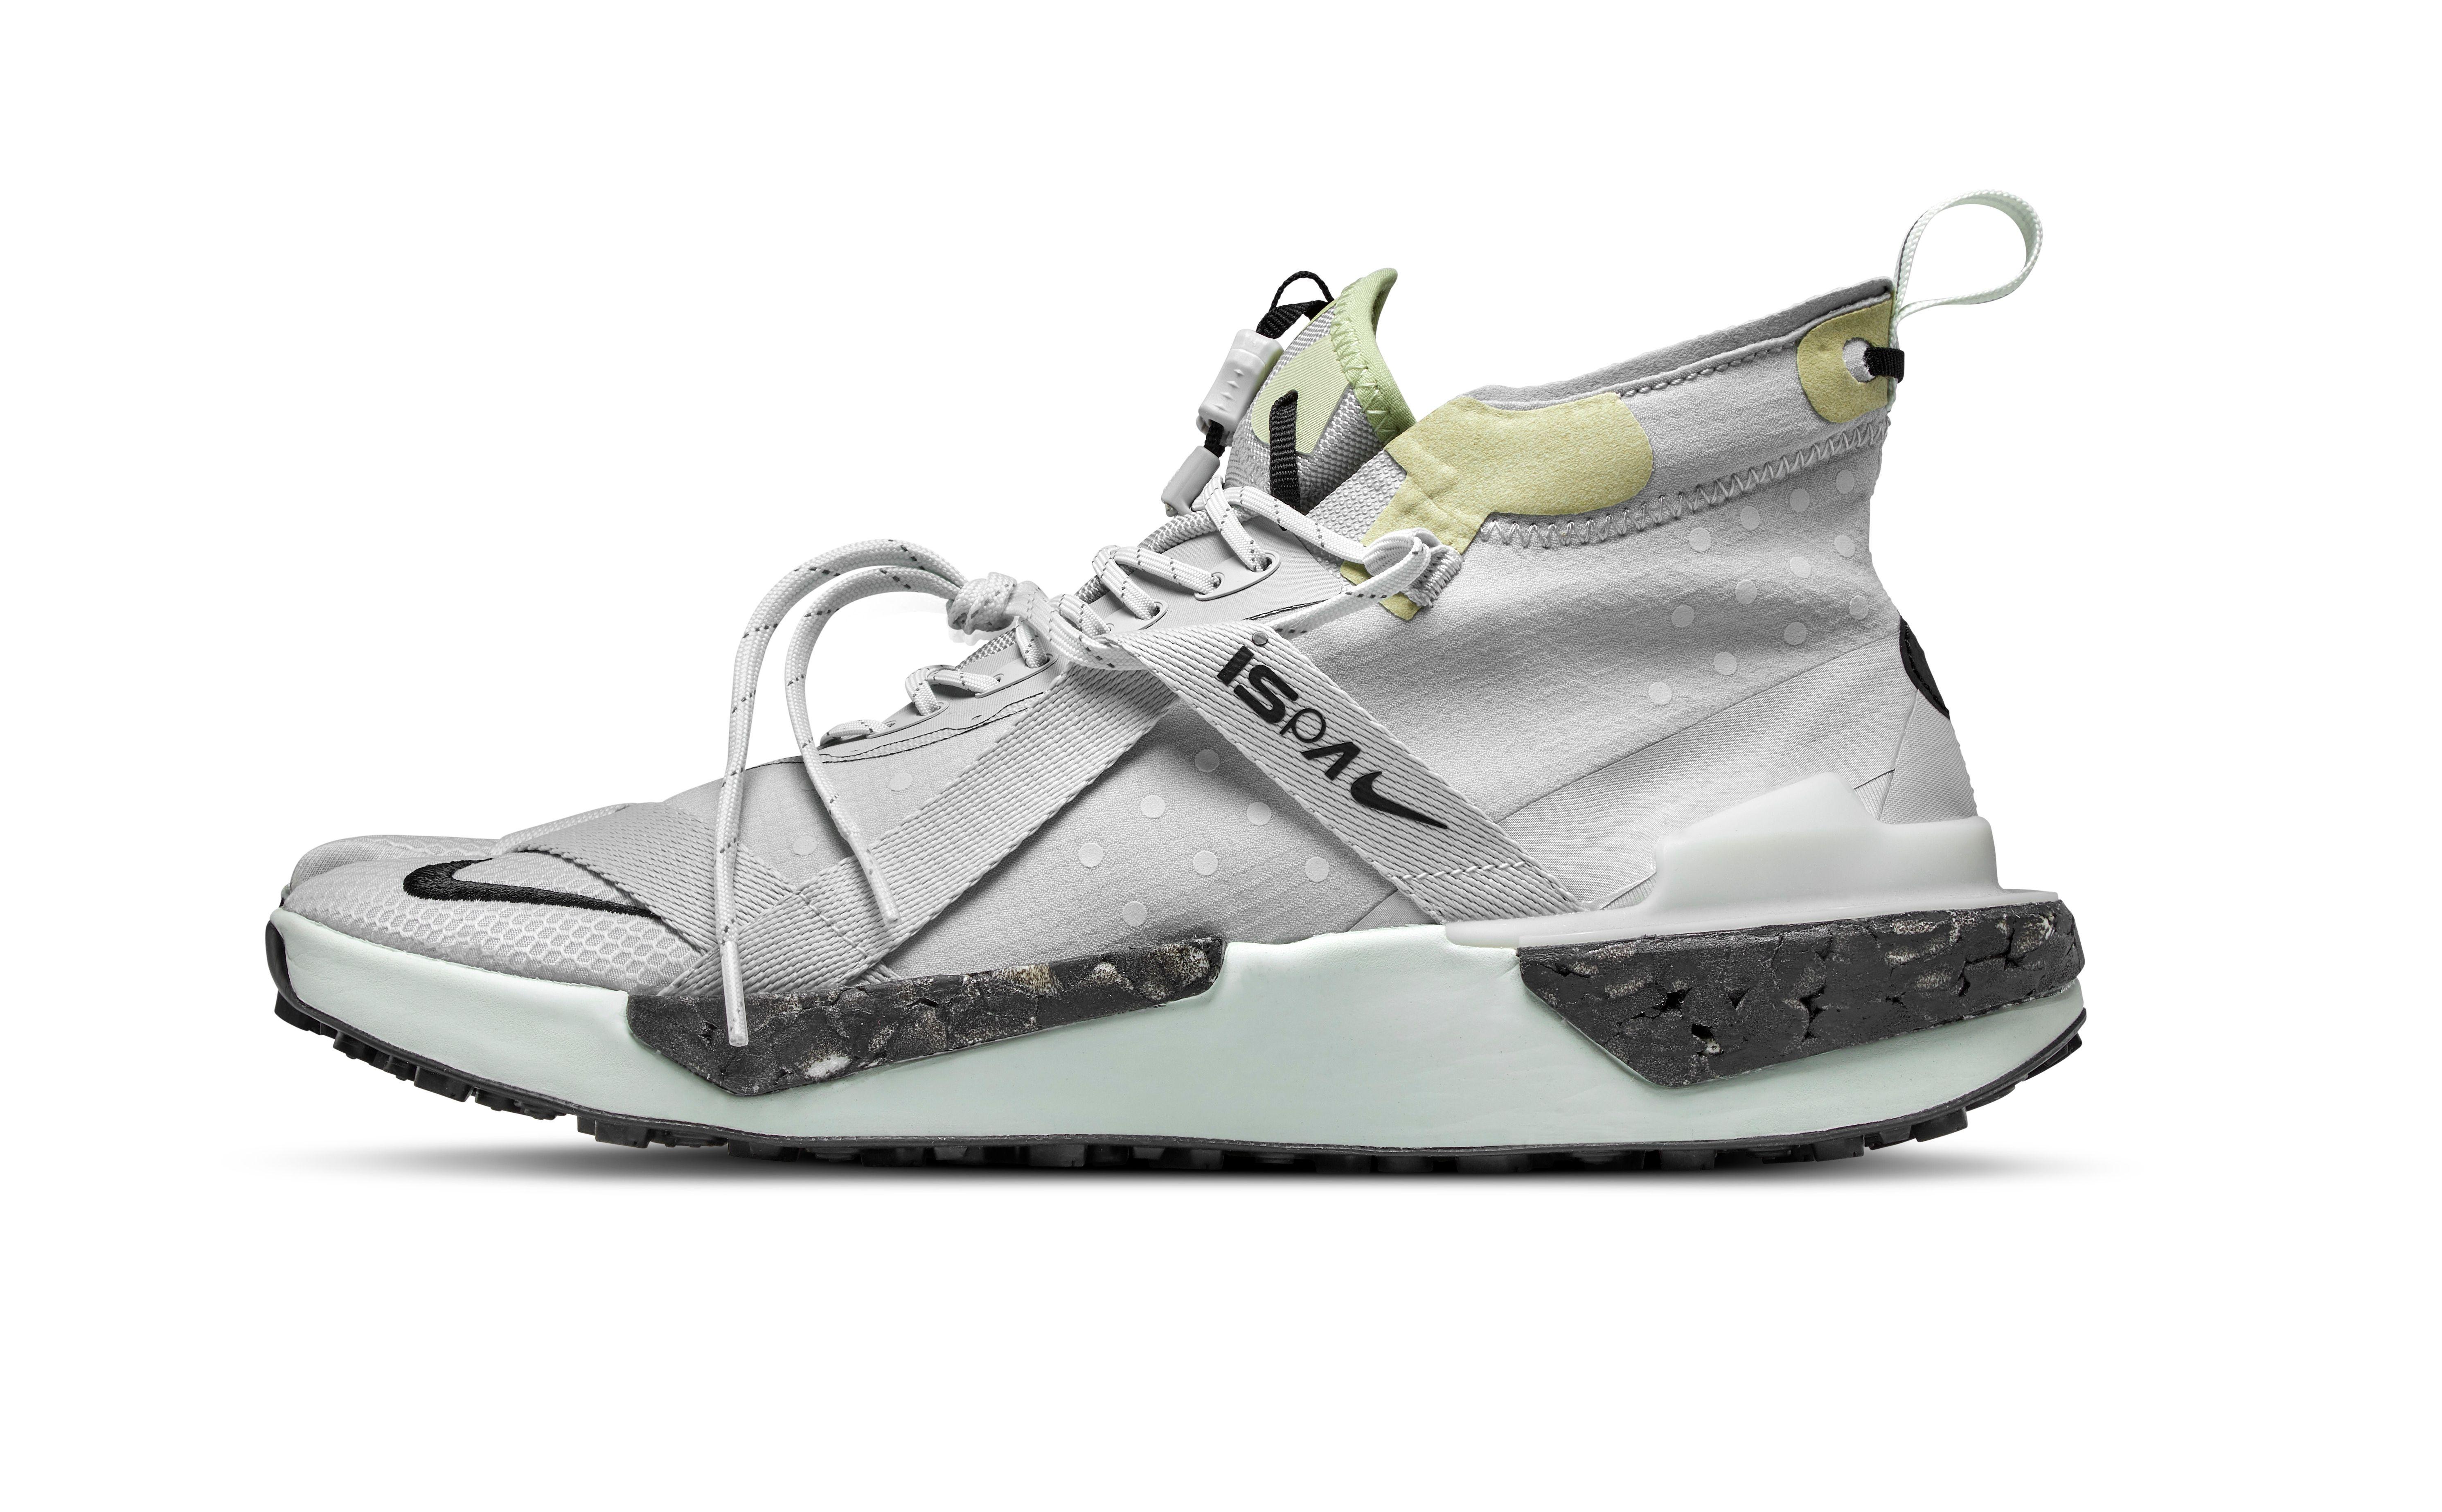 Nike ISPA Drifter Left